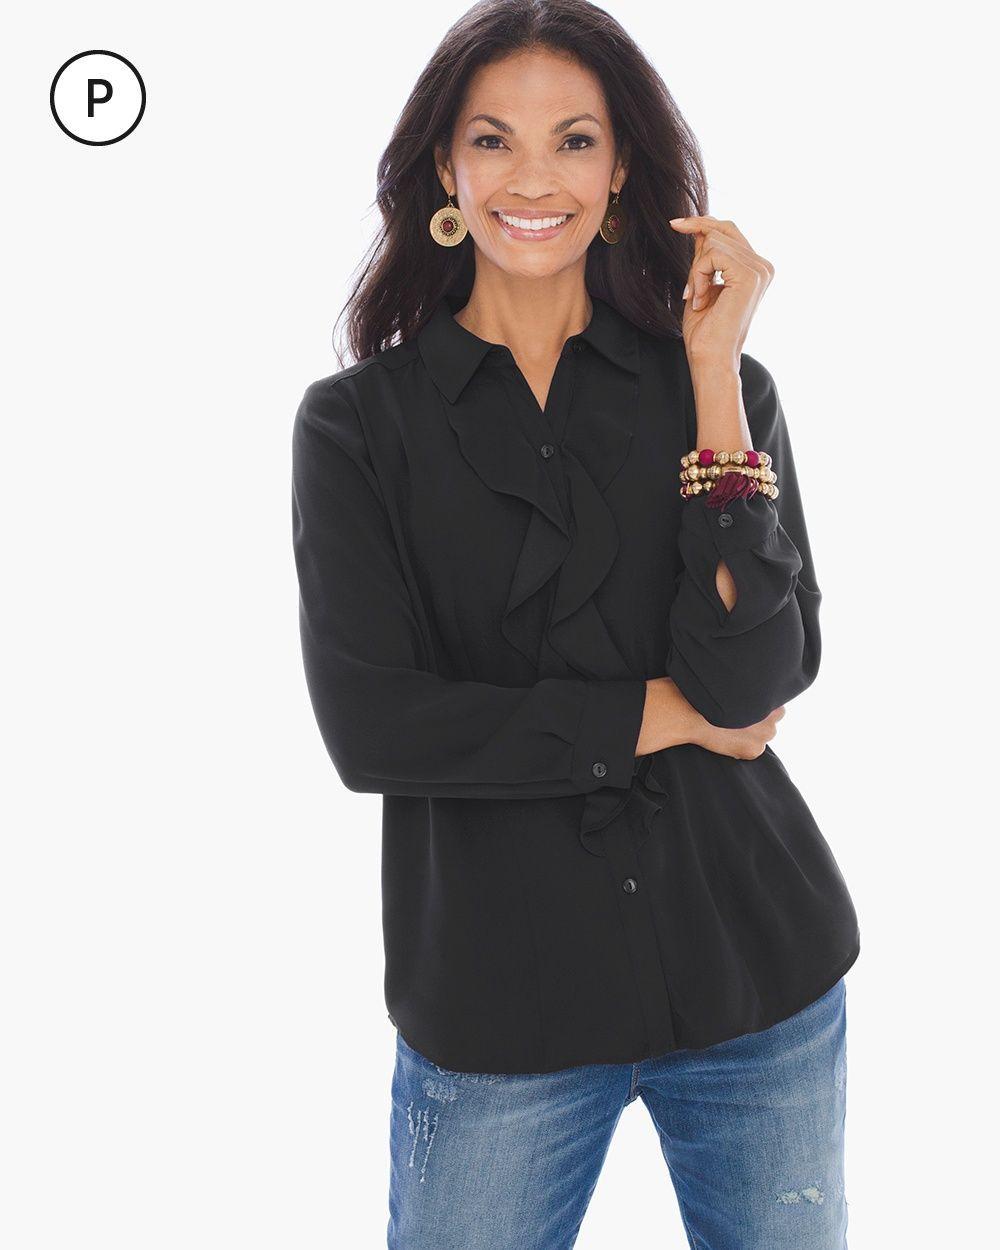 Chico's Women's Petite Ruffle-Front Shirt, Black, Size: 3P (16P/18P XL)